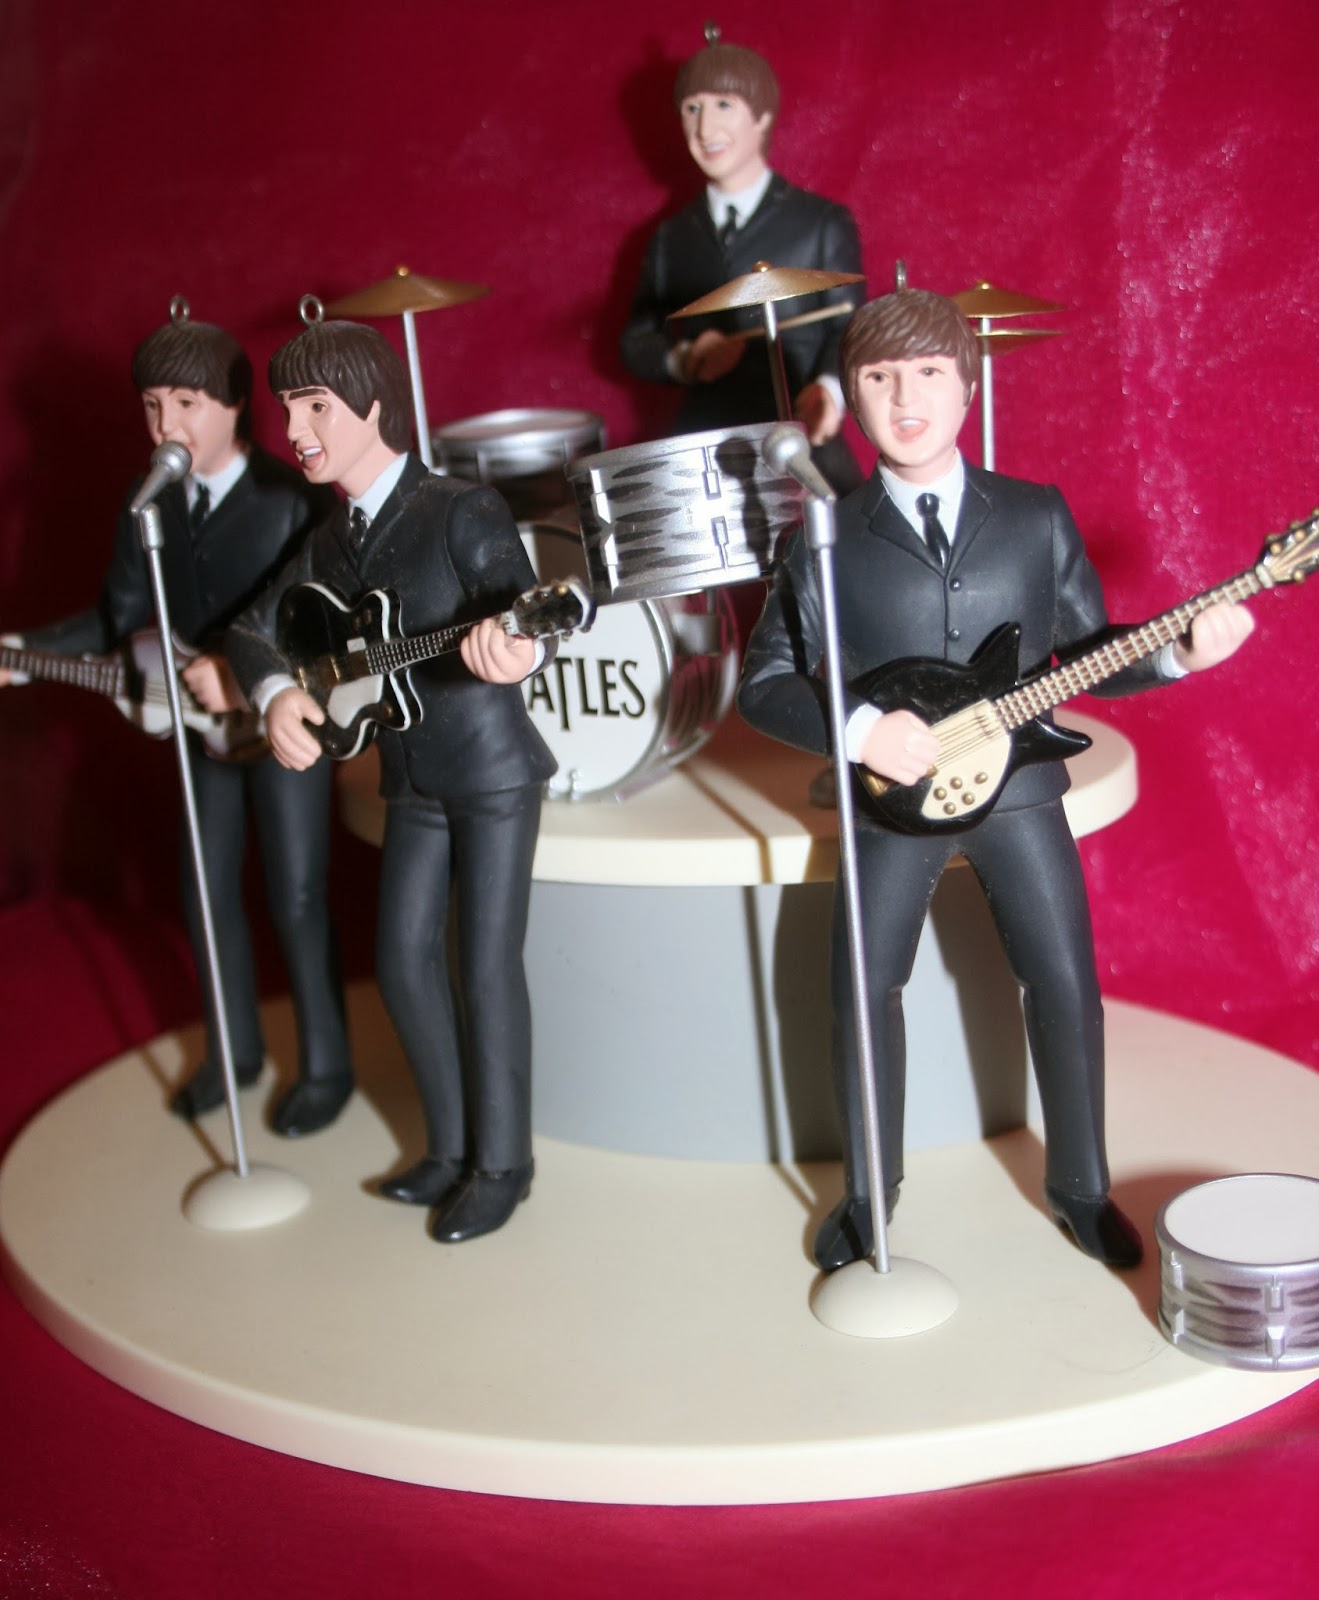 PLANET OF THE DOLLS: Happy Beatles Birthdays Part 2